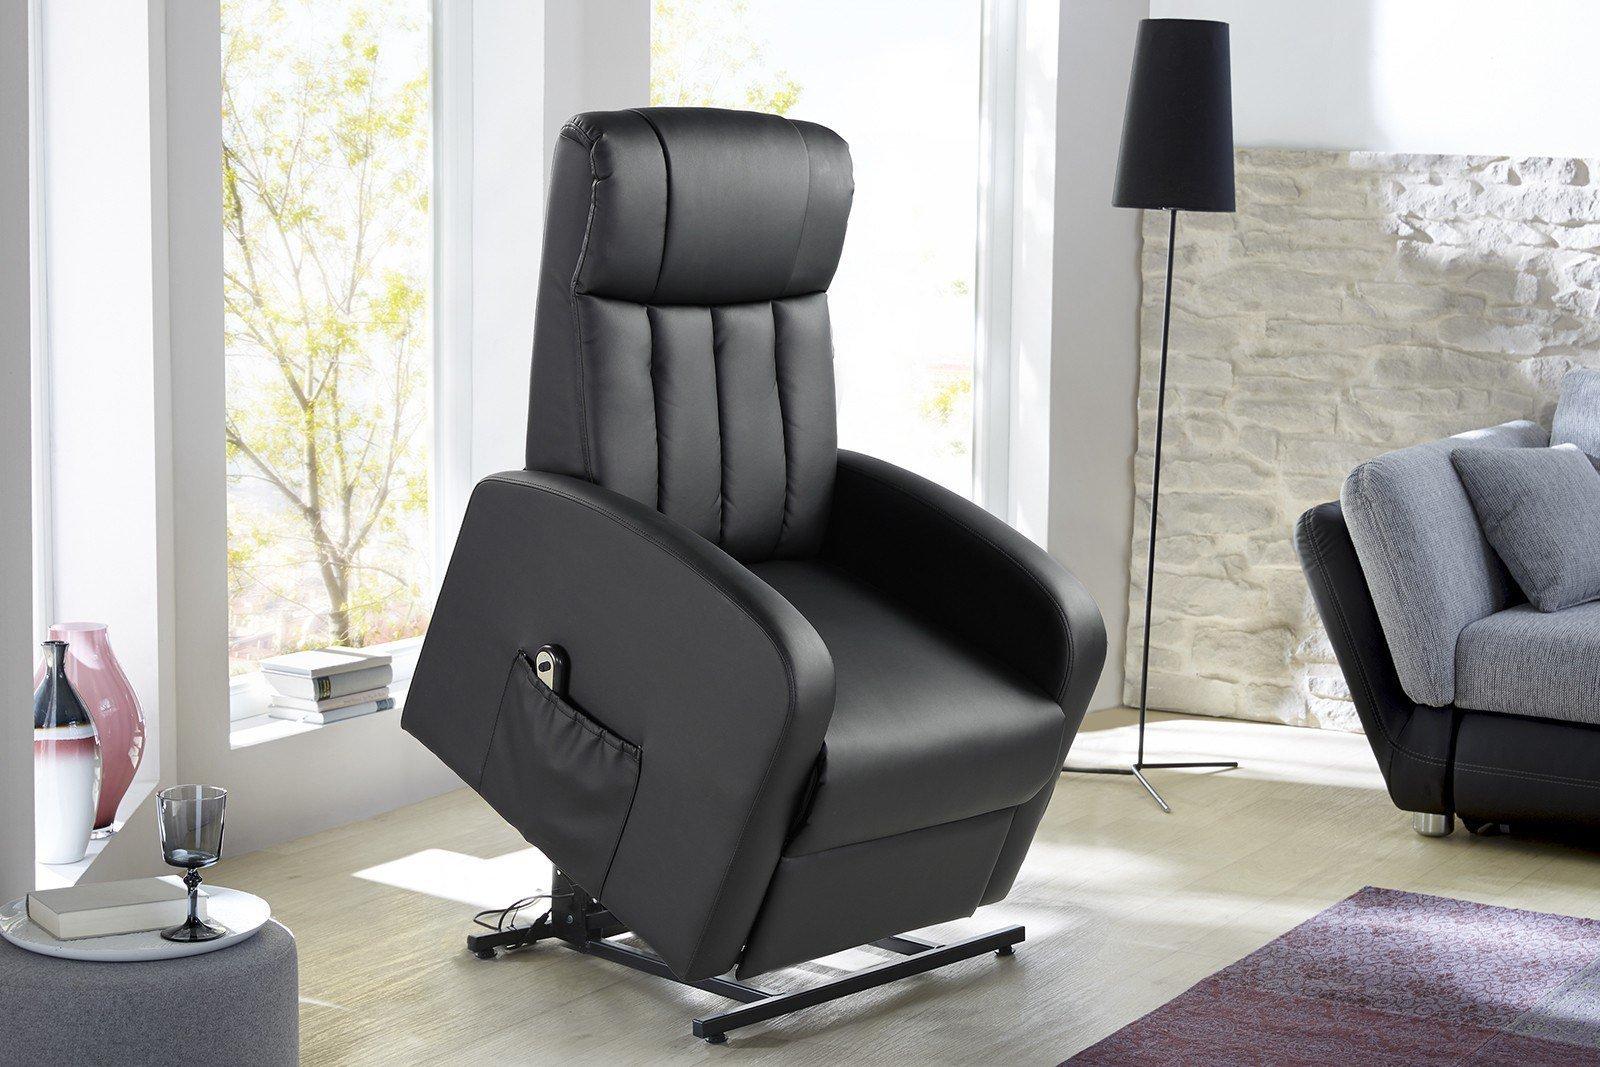 pro com jackson relaxsessel schwarz m bel letz ihr. Black Bedroom Furniture Sets. Home Design Ideas